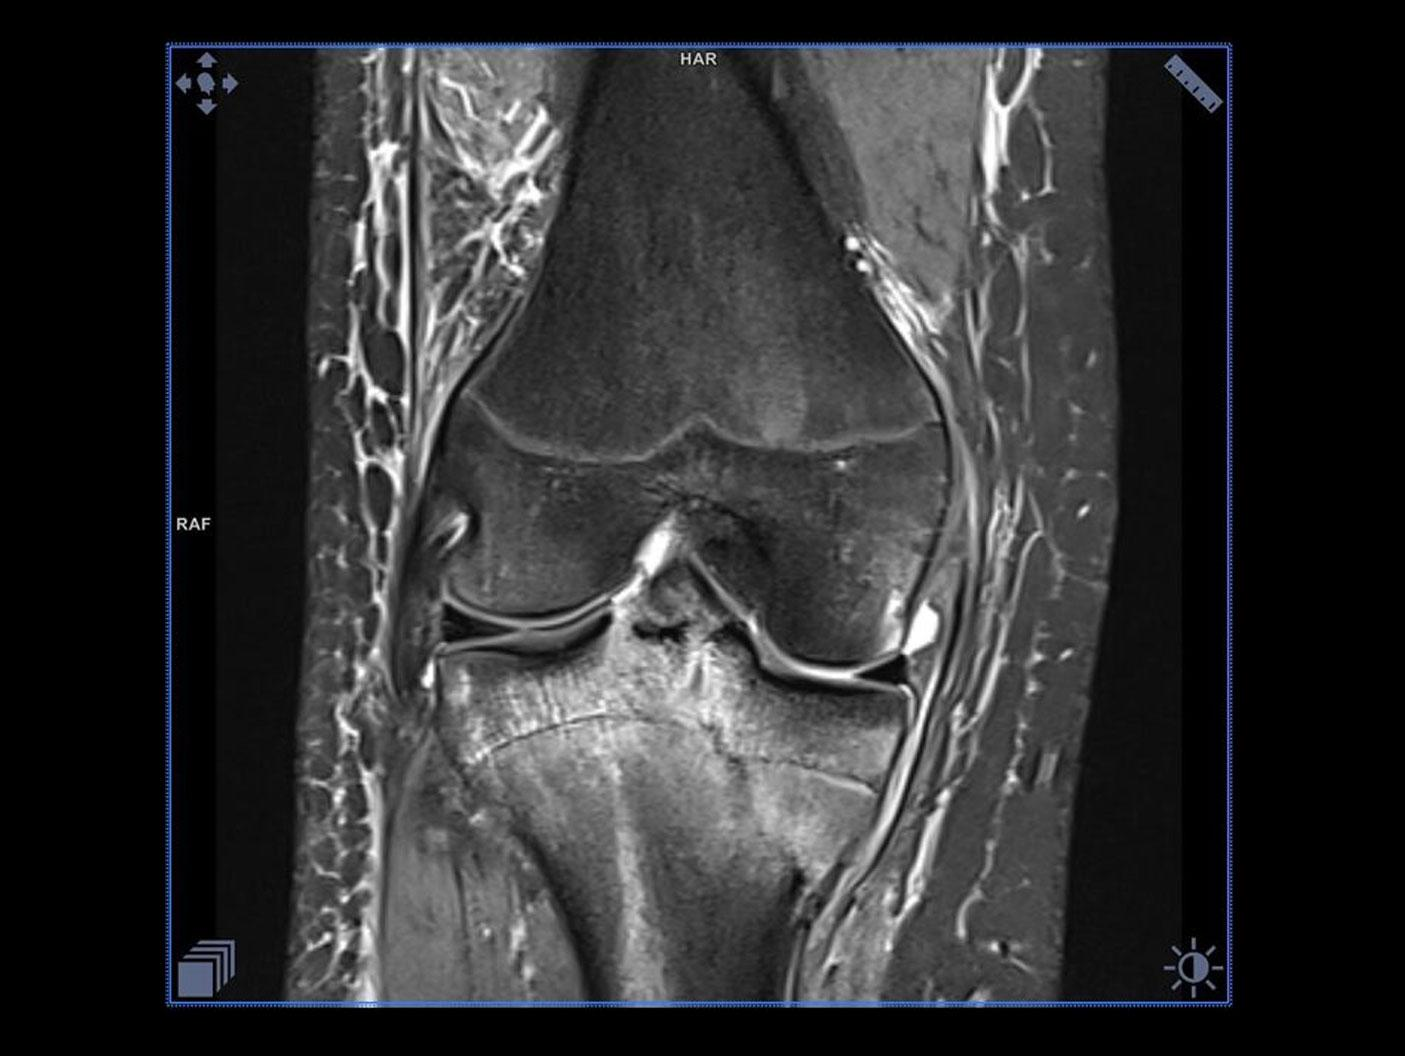 MSK Phoenix Images for MAGNETOM Sempra 1.5T – Knee: Using the 8-ch kneel coil